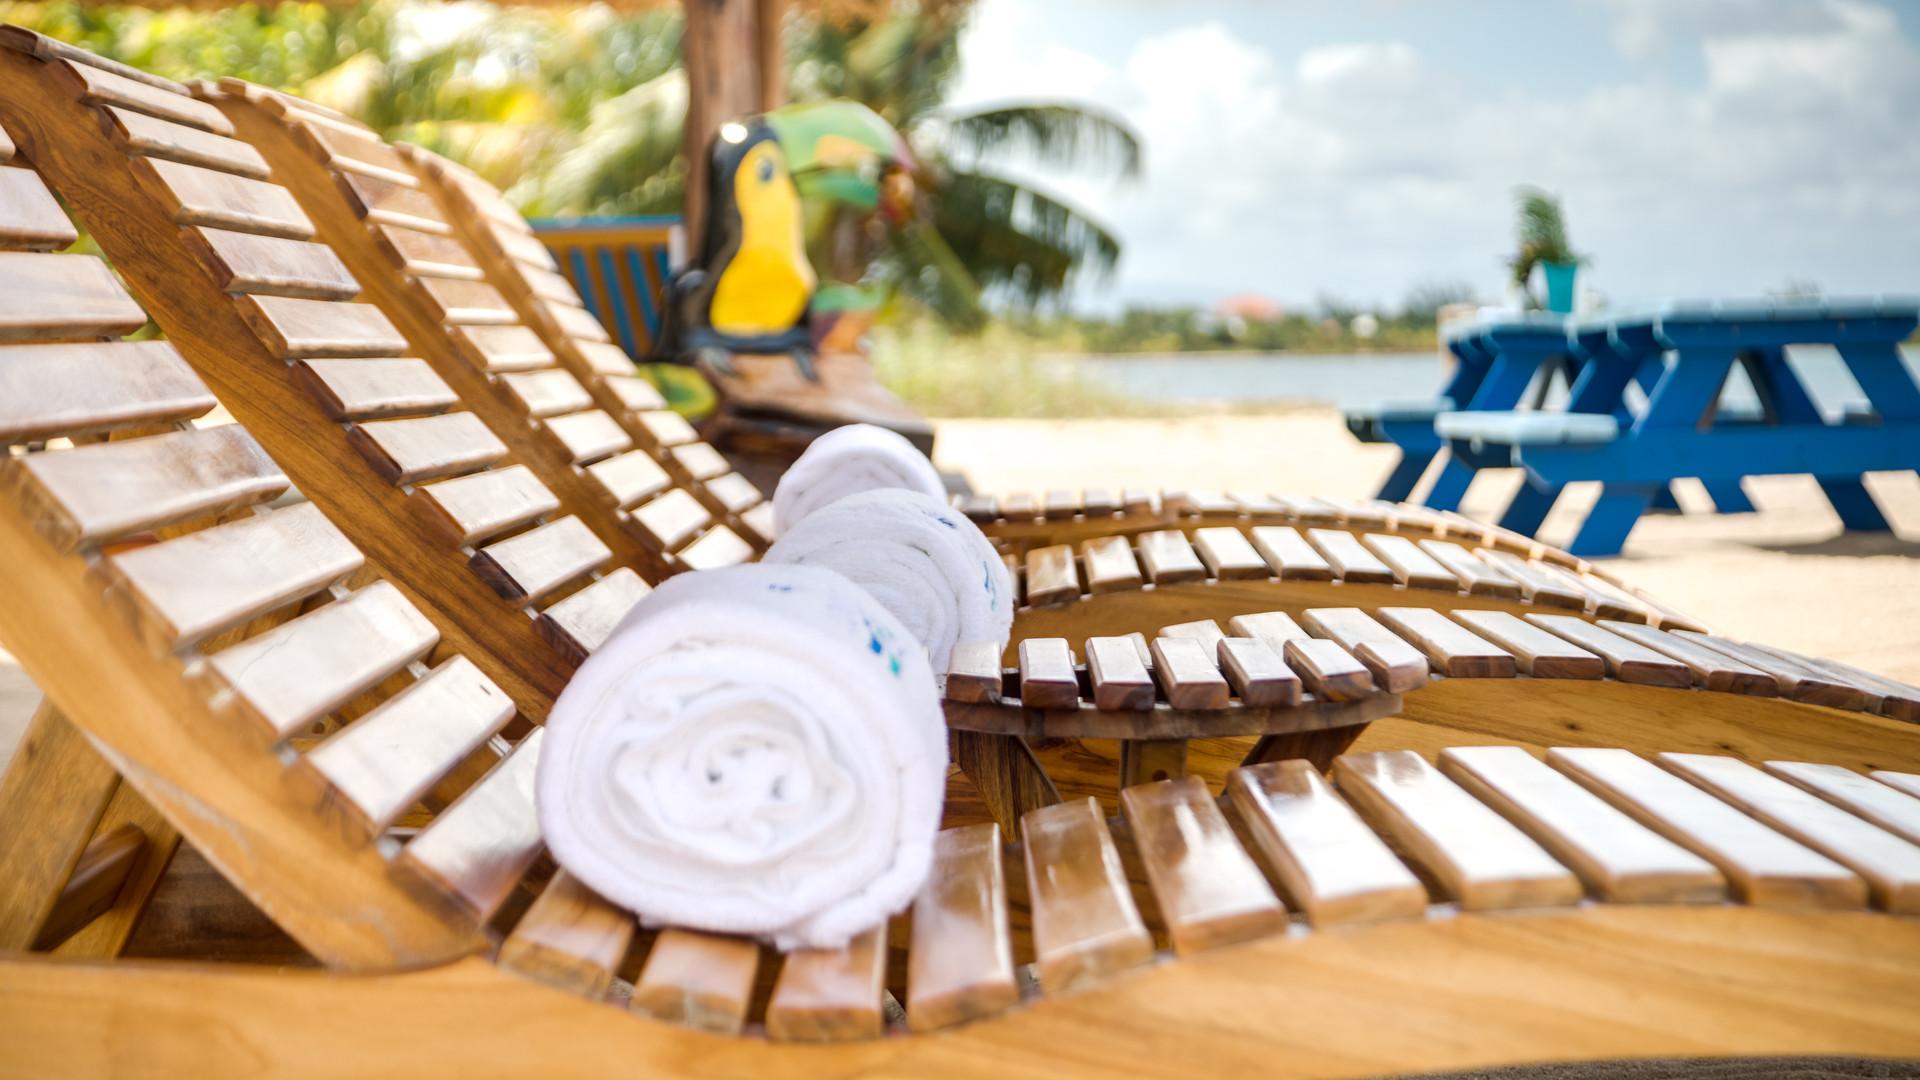 Ocean Breeze - Lounge chairs